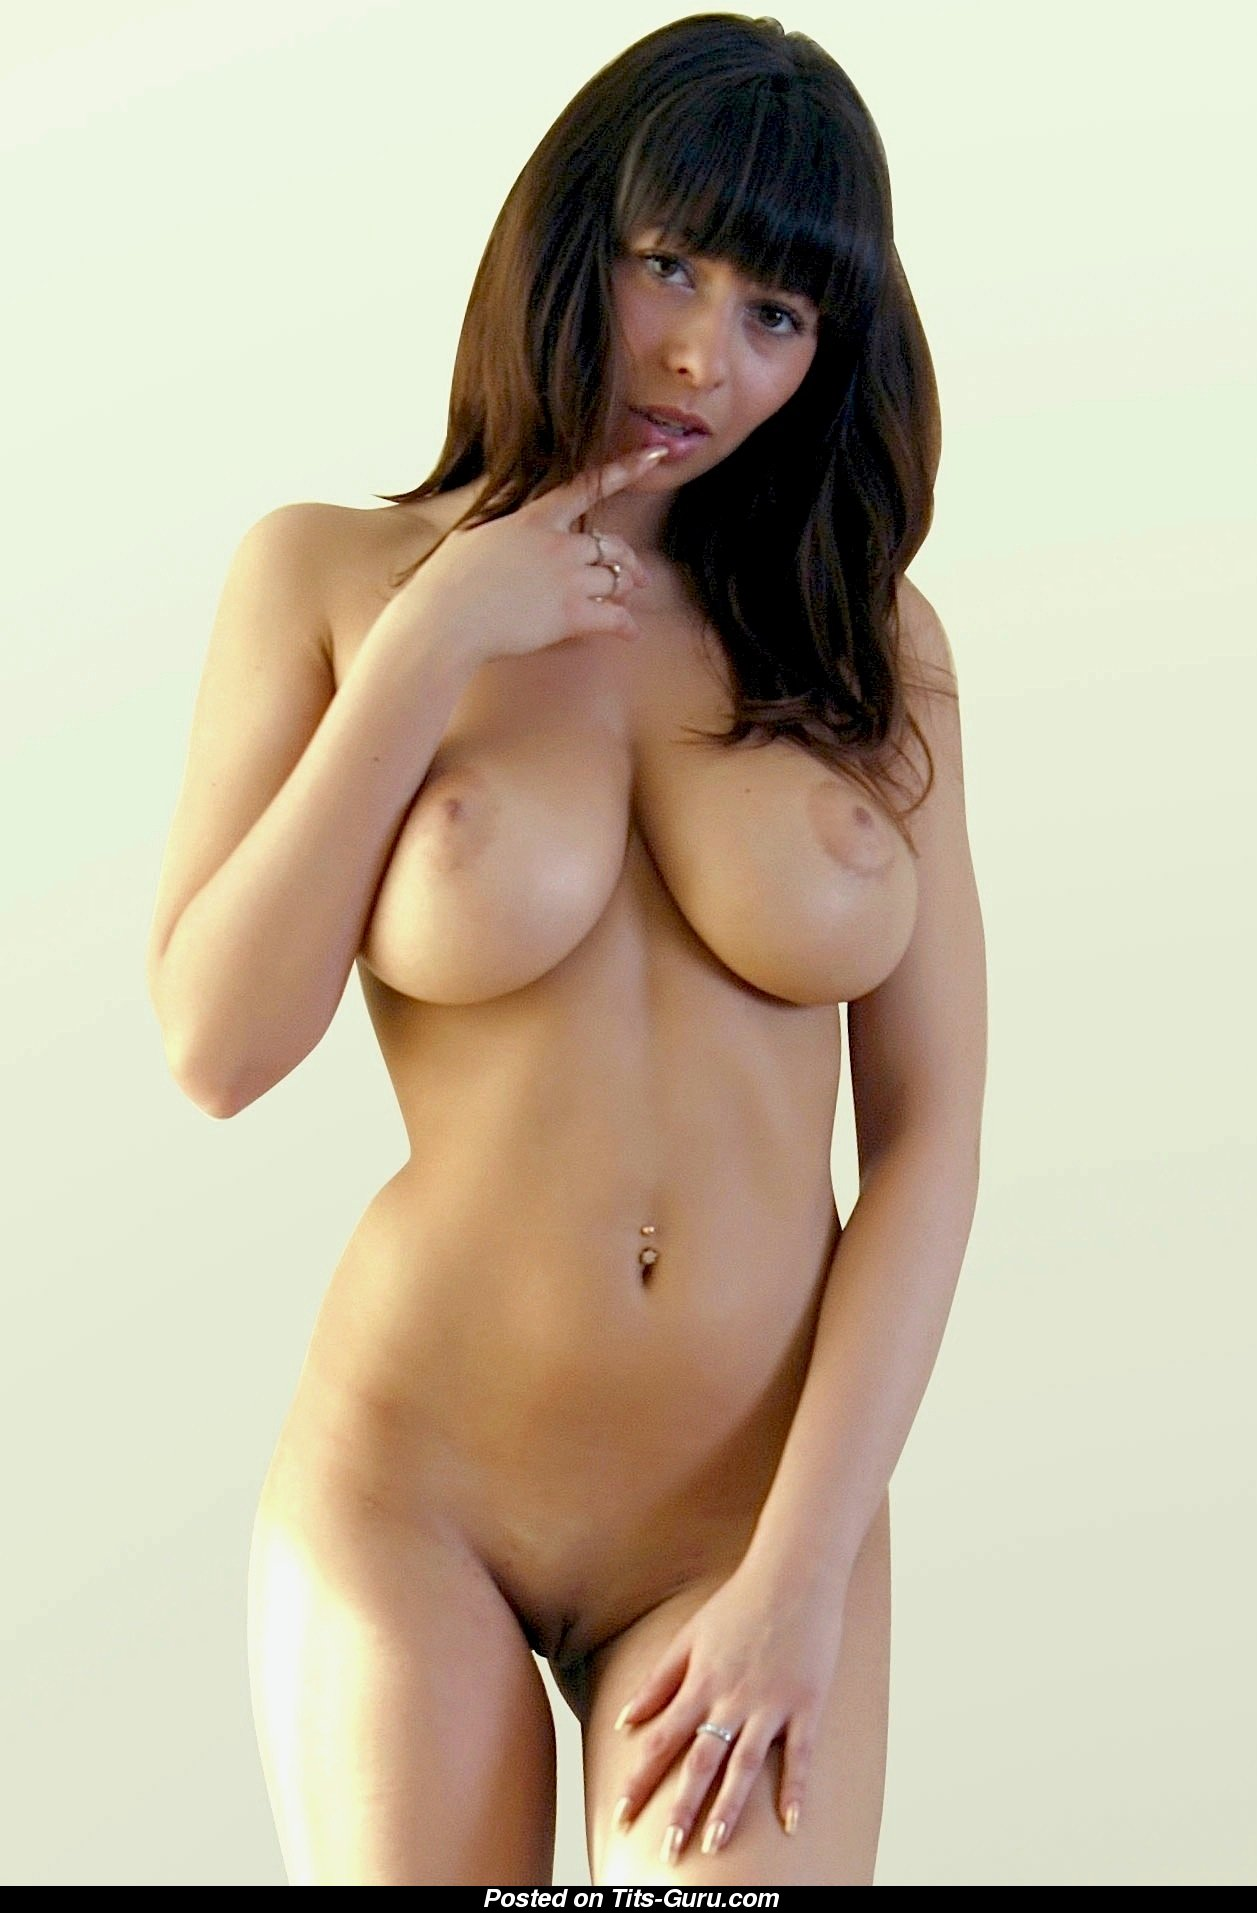 Eva mendes hd porn images